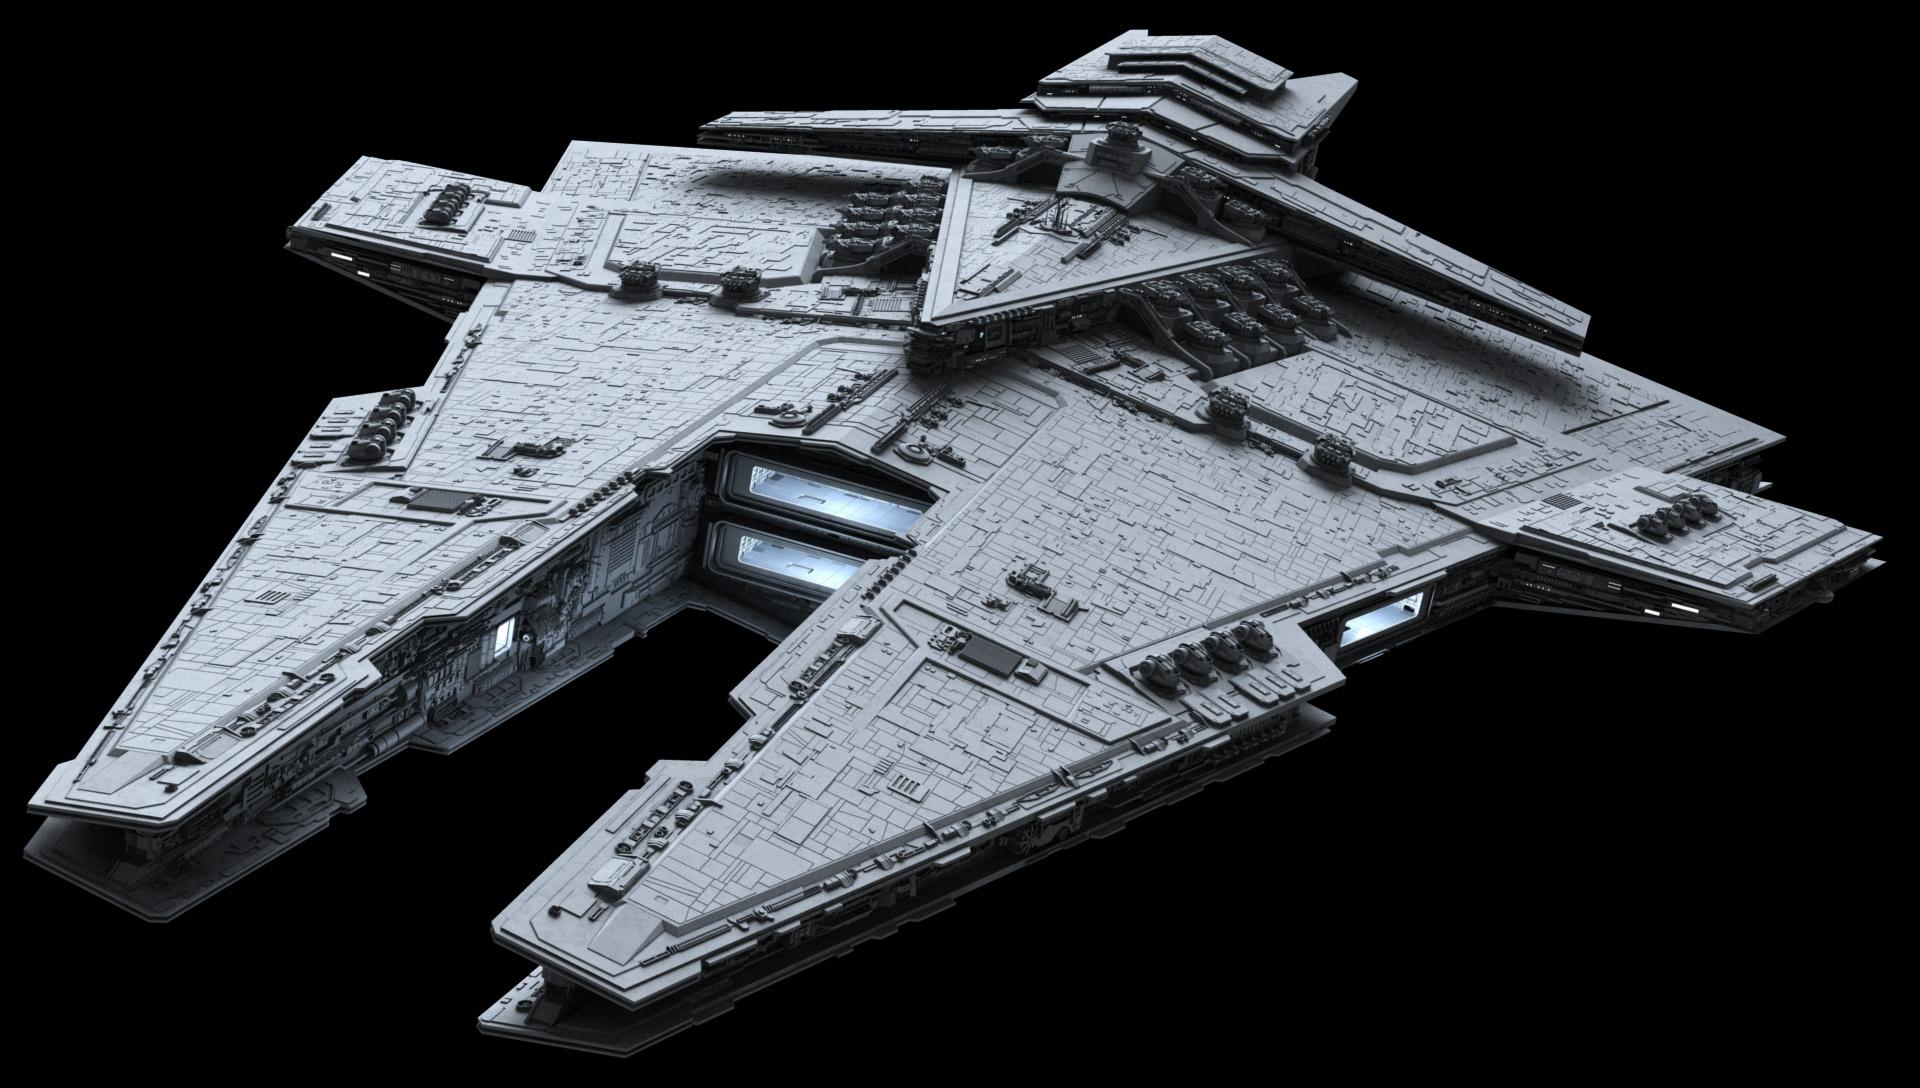 Spaceship.